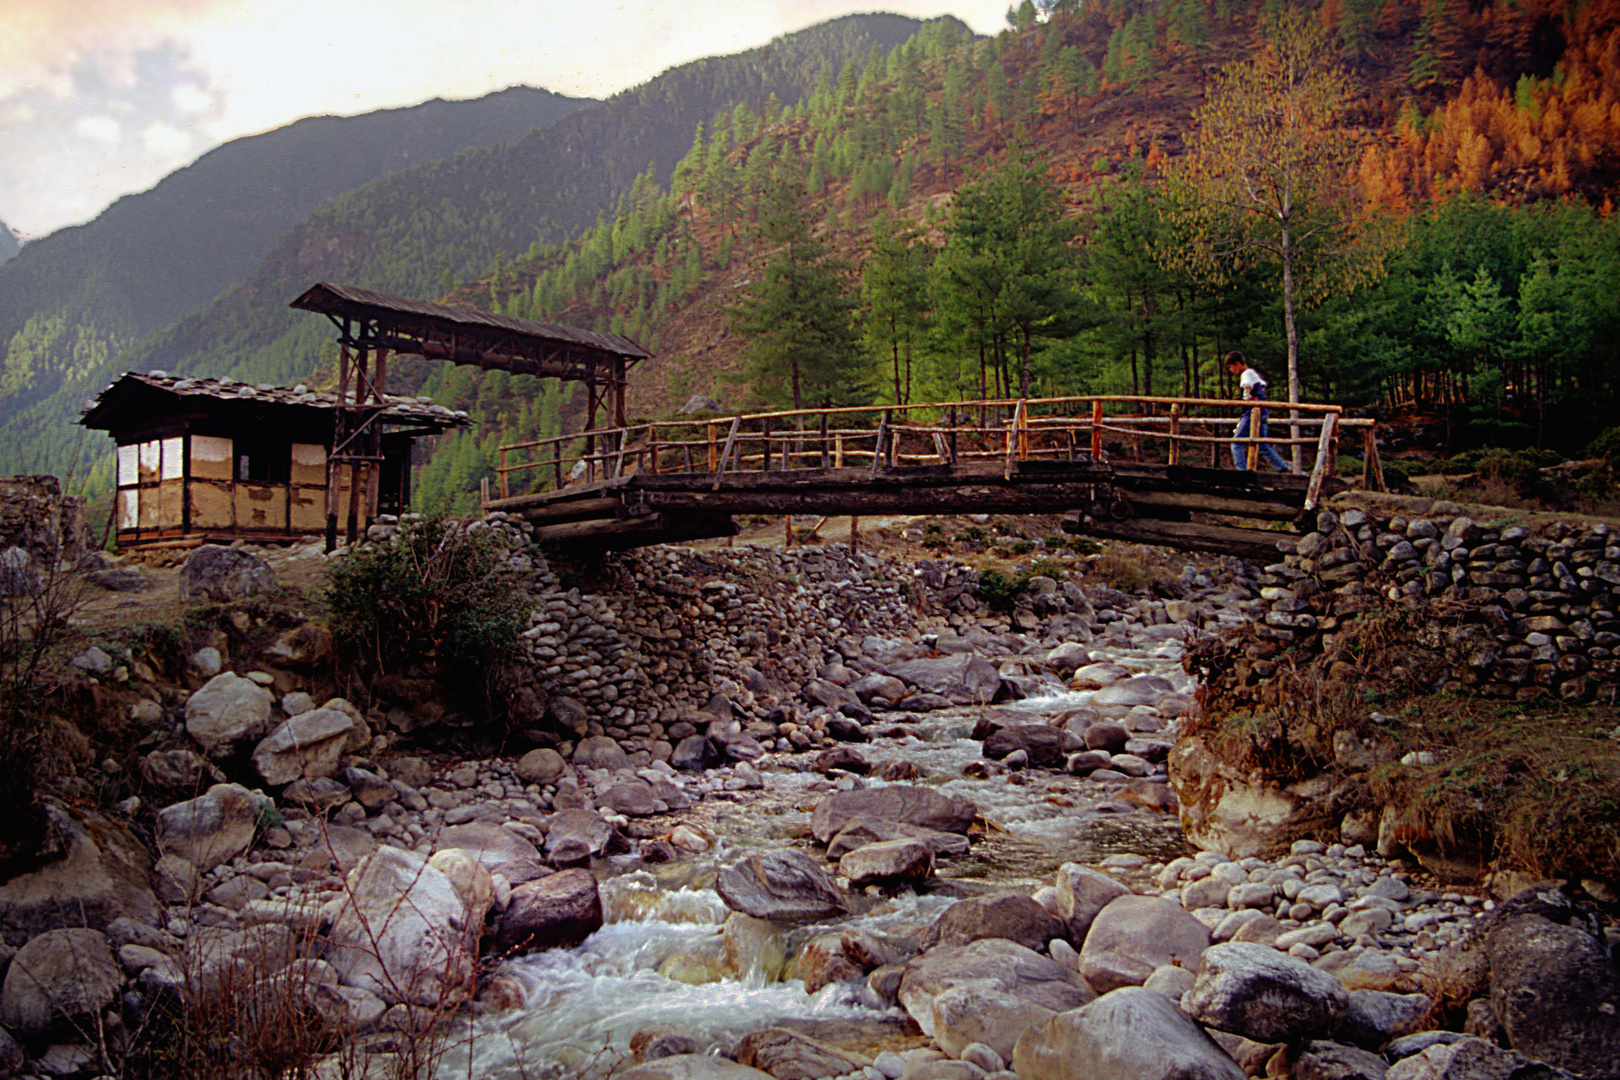 Crossing the Paro Chu river to the Jomolhari base camp